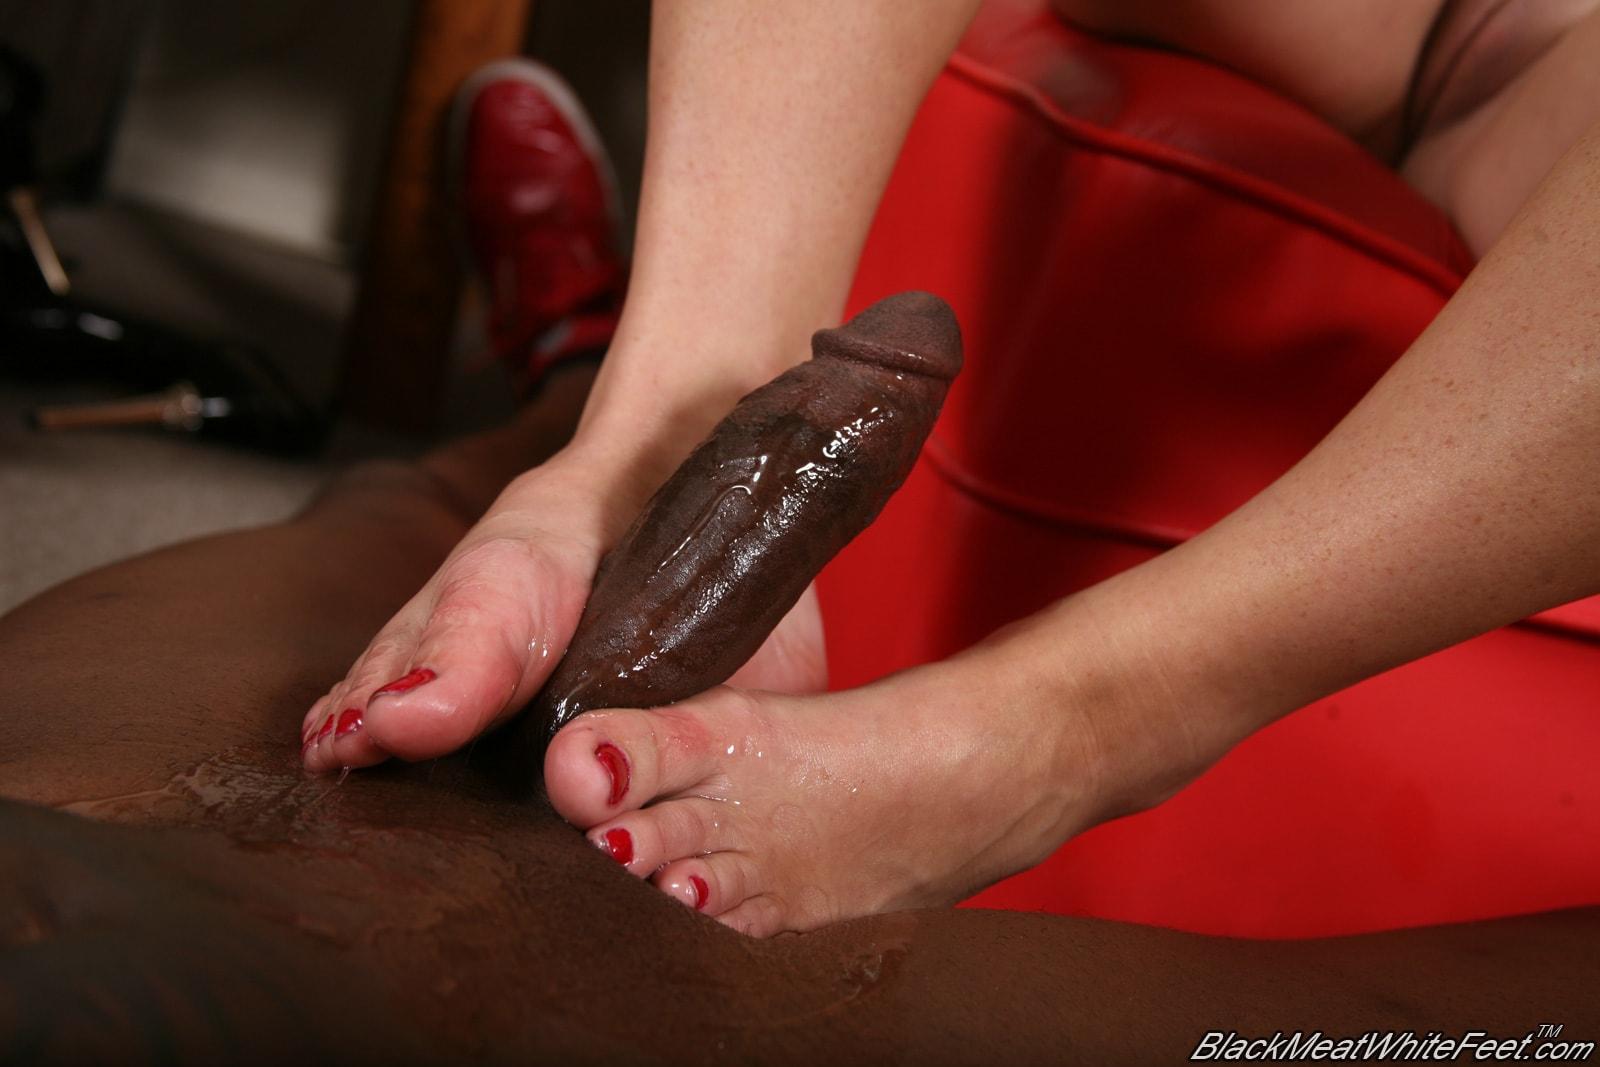 Porn Online Foot Fetish Petite Ginger Babbi Petite Feet Big Black Meat